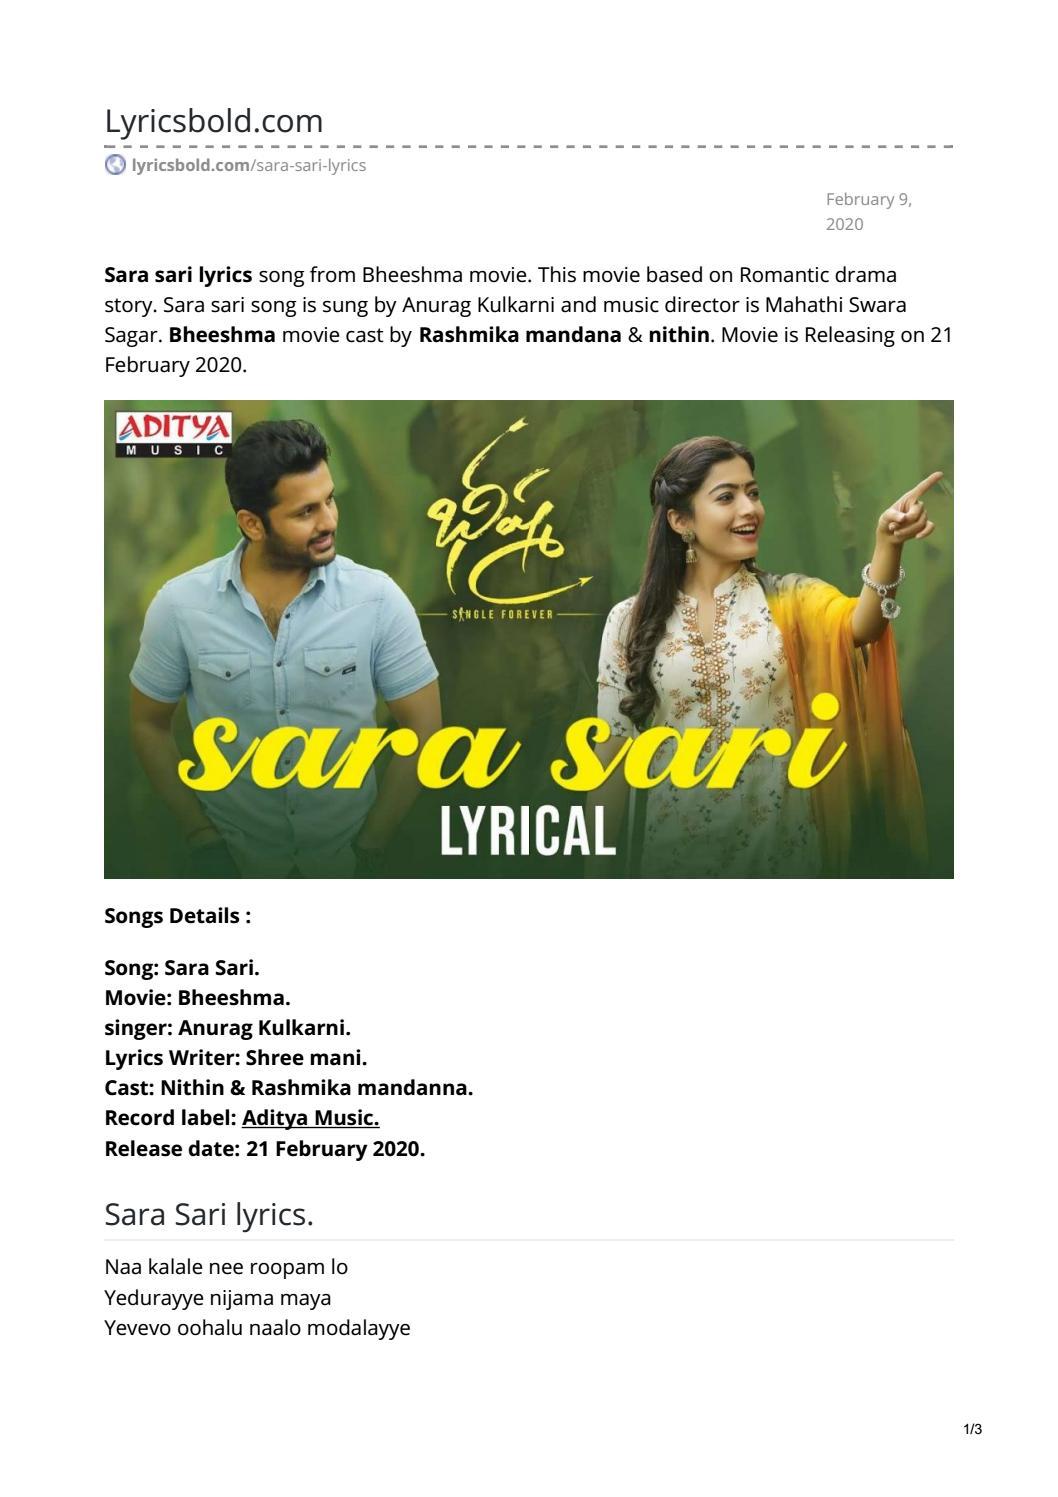 Pachtaoge Lyrics By Swarajsirsat123 Issuu